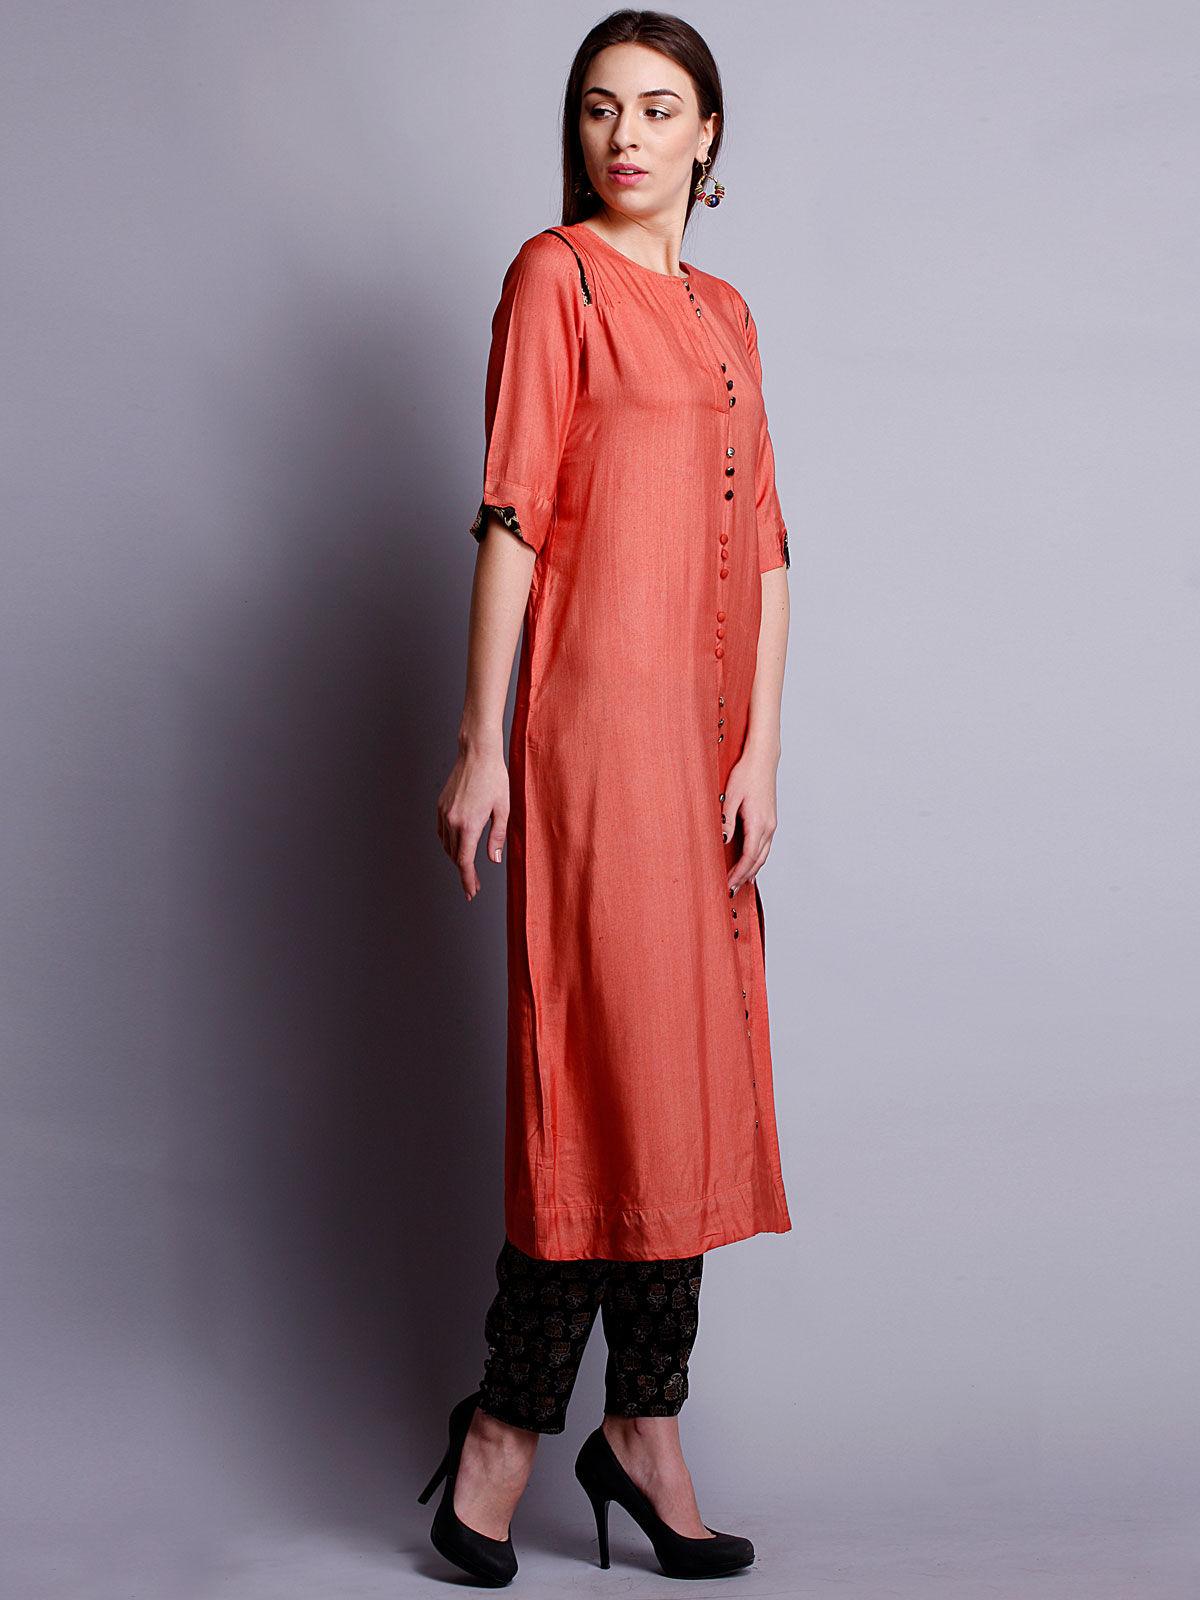 Orange cotton silk long kurta with bottom